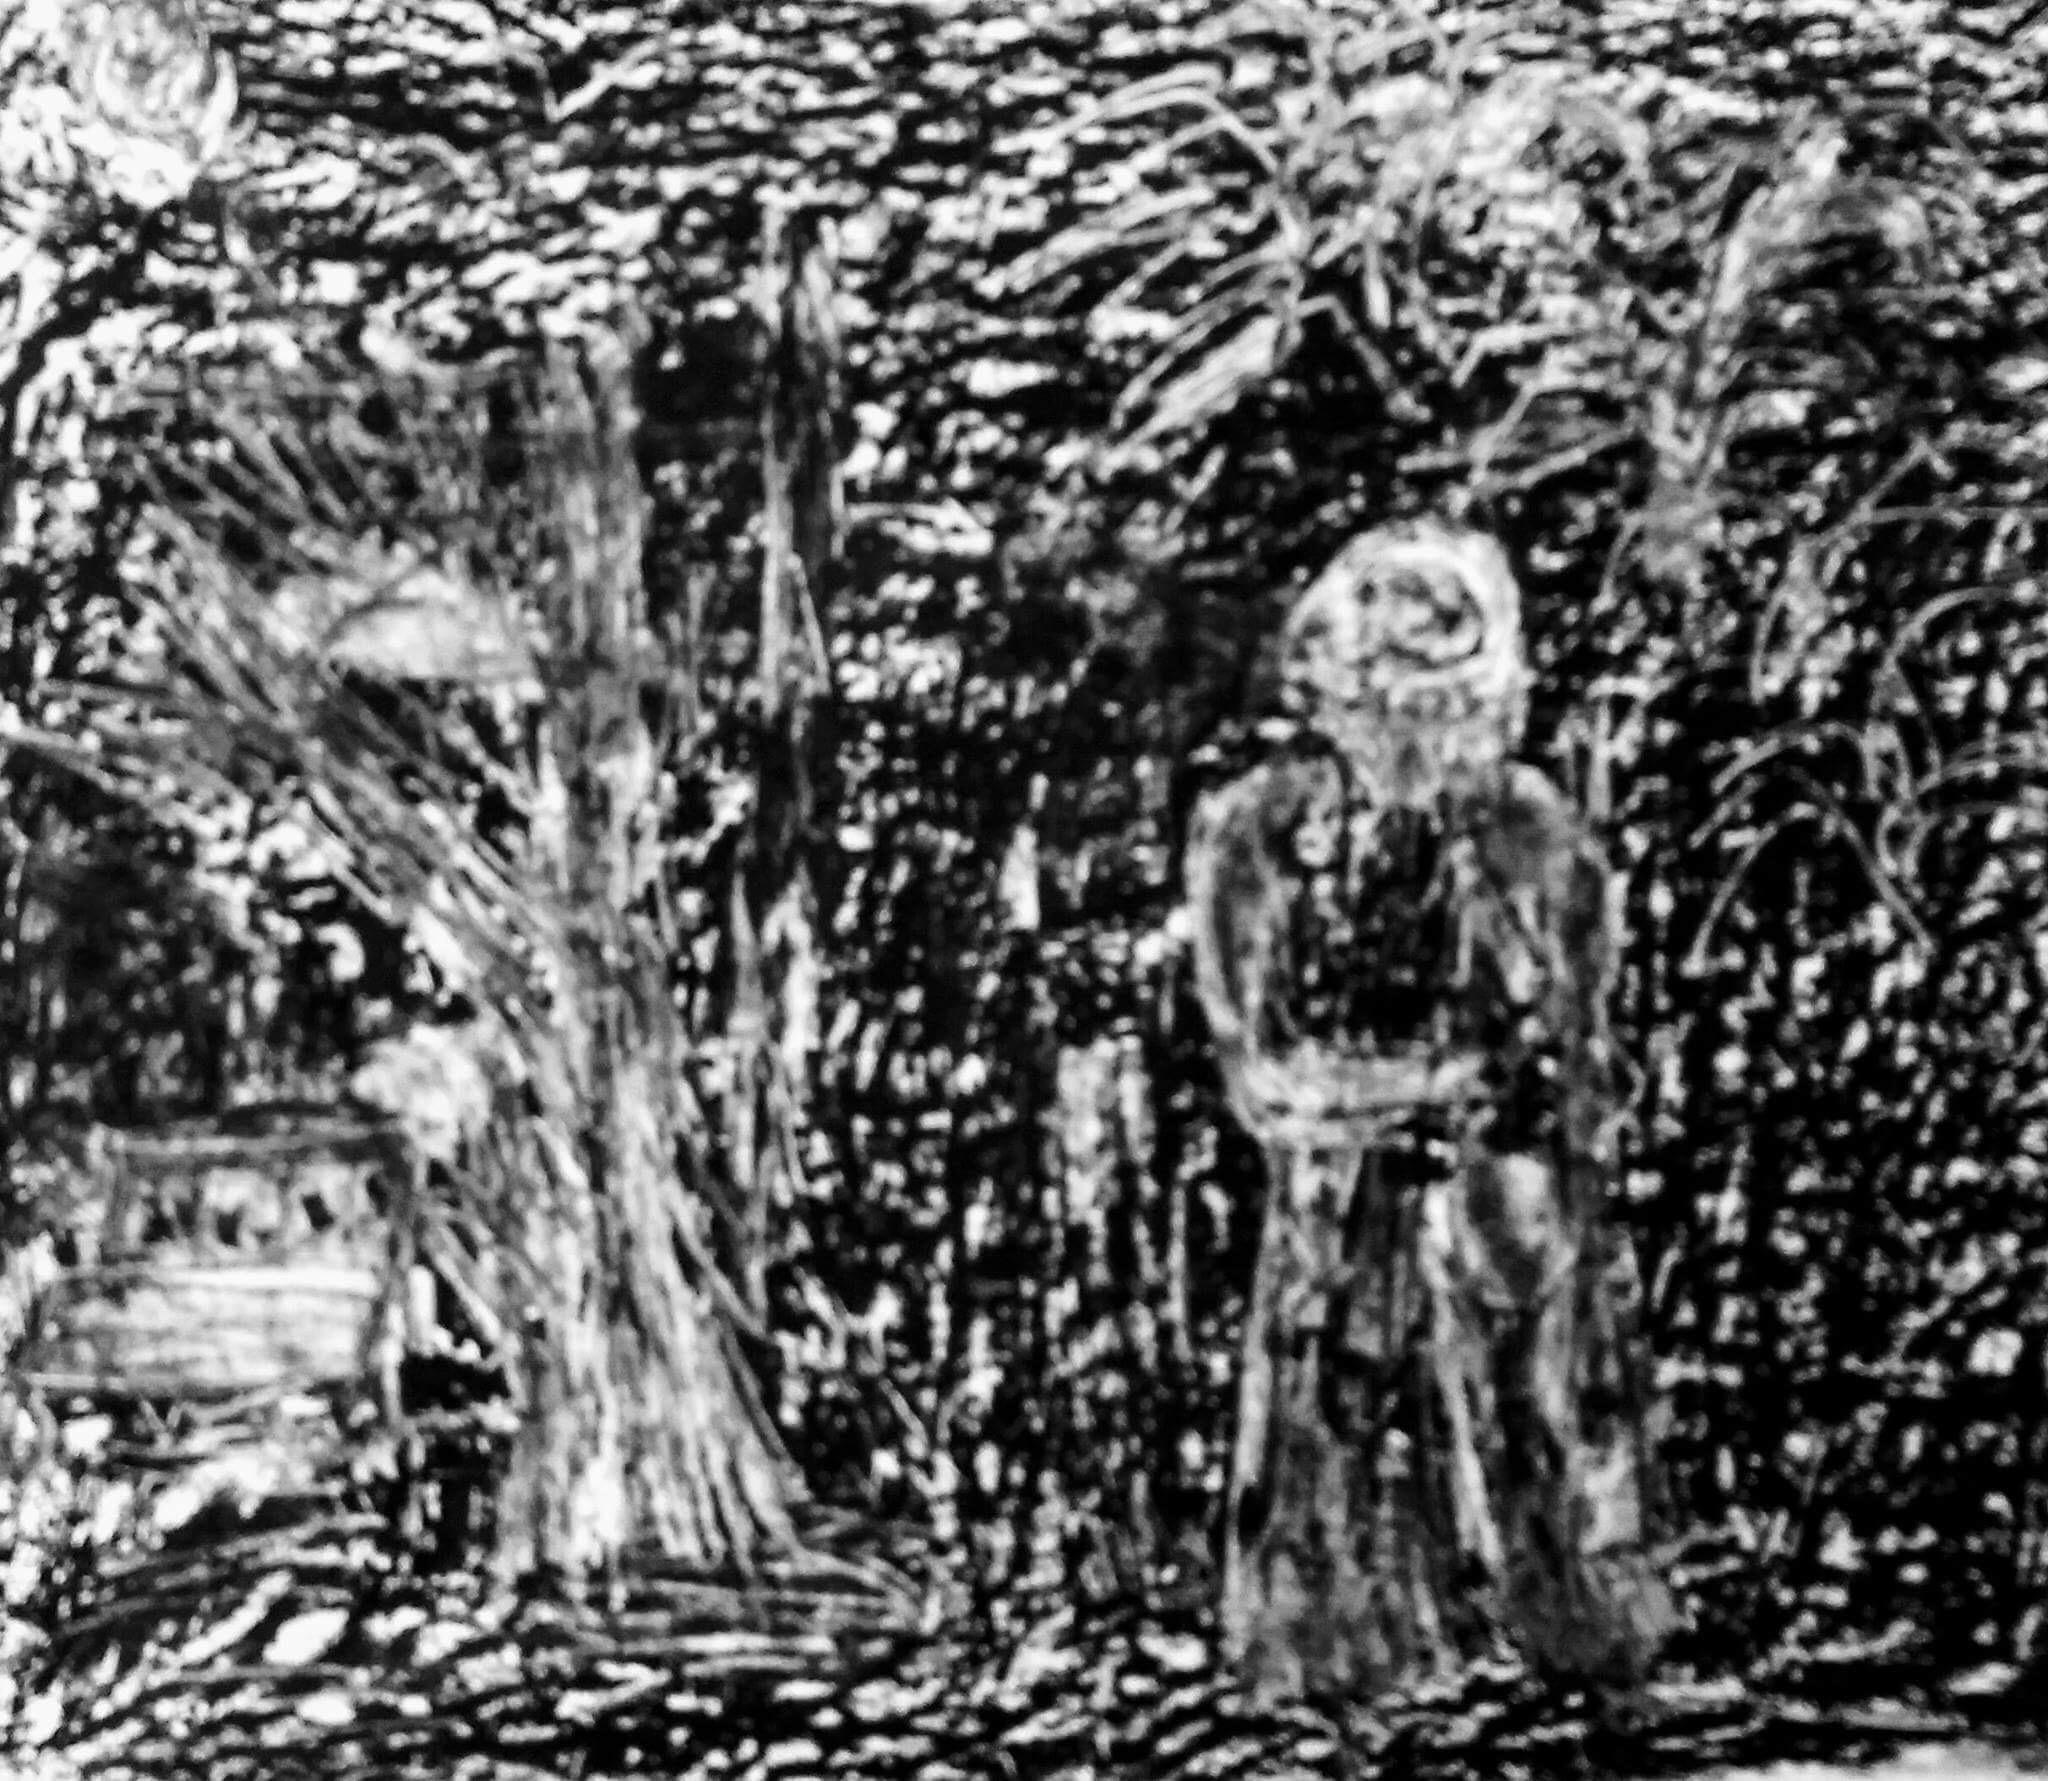 Artwork from the book - לכתוב ולצייר ירח שירים- שולמית ספיר-נבו 🌙 😊 🌛😍 ציורים וצילומים- אירית סלע גבורי by Shulamit Sapir-Nevo - Illustrated by אירית סלע גבורי - Ourboox.com